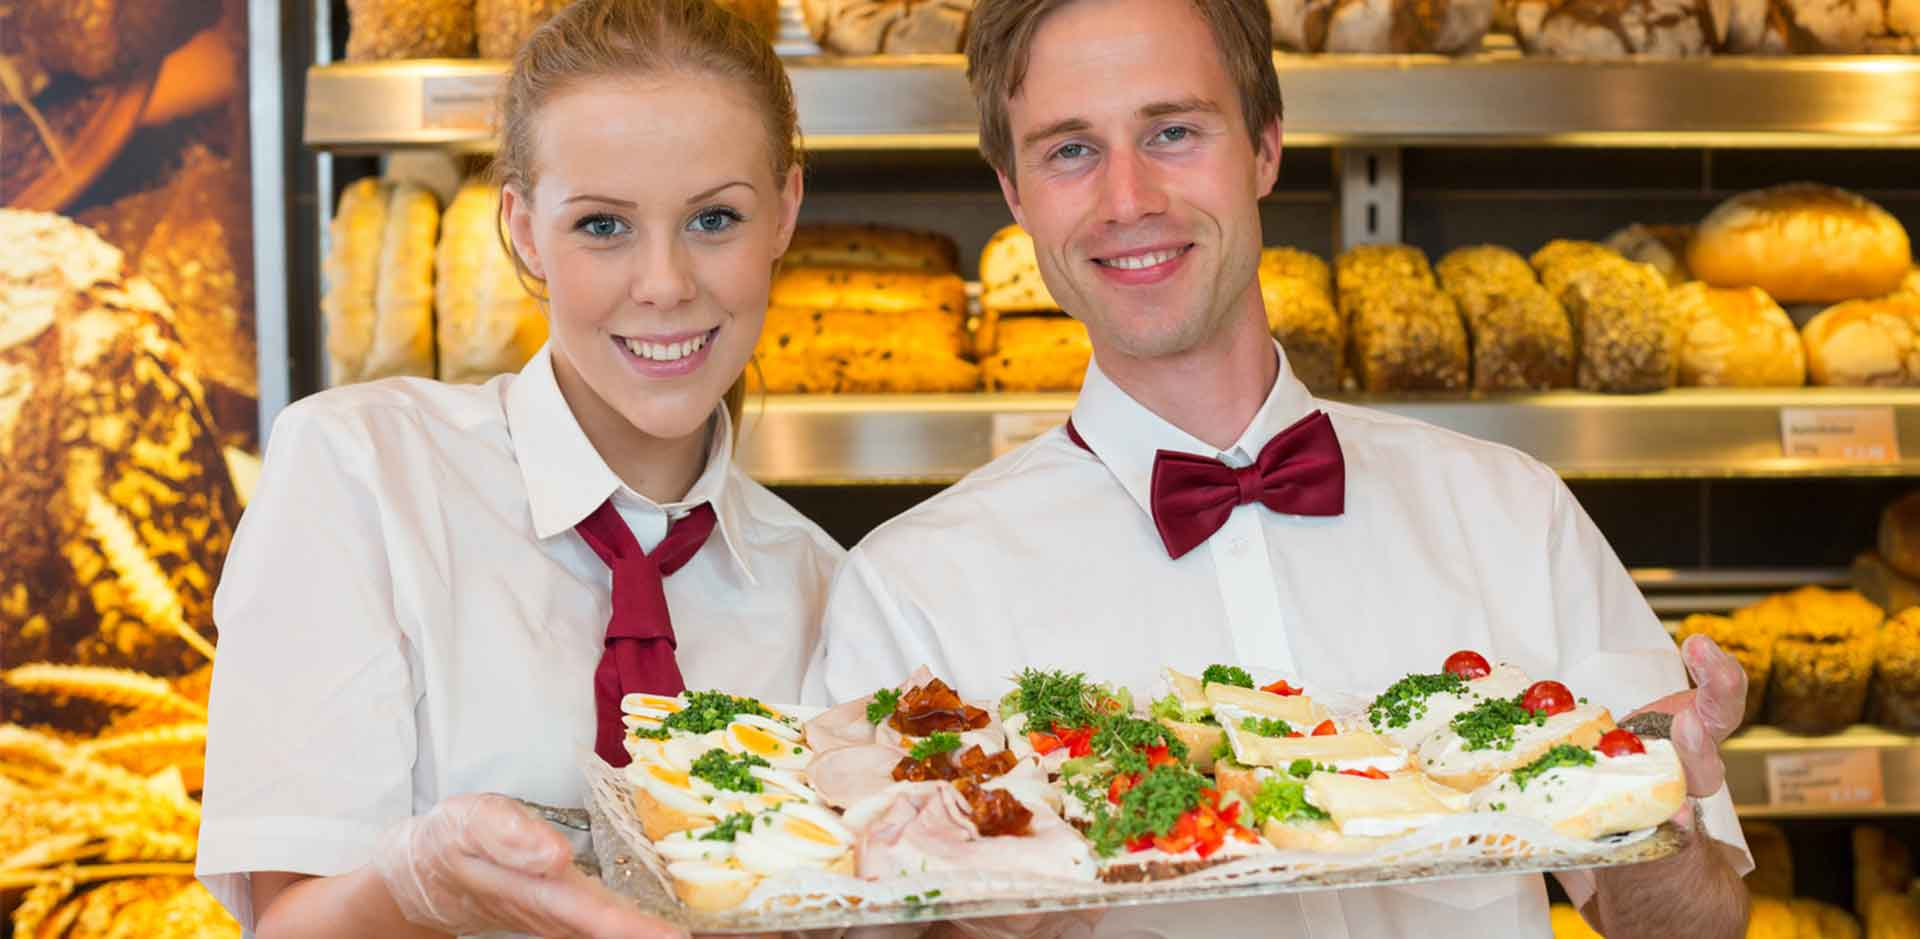 Visual Merchandising Bäckerei - Online Marketing Tools Food - Food Design mit Springform